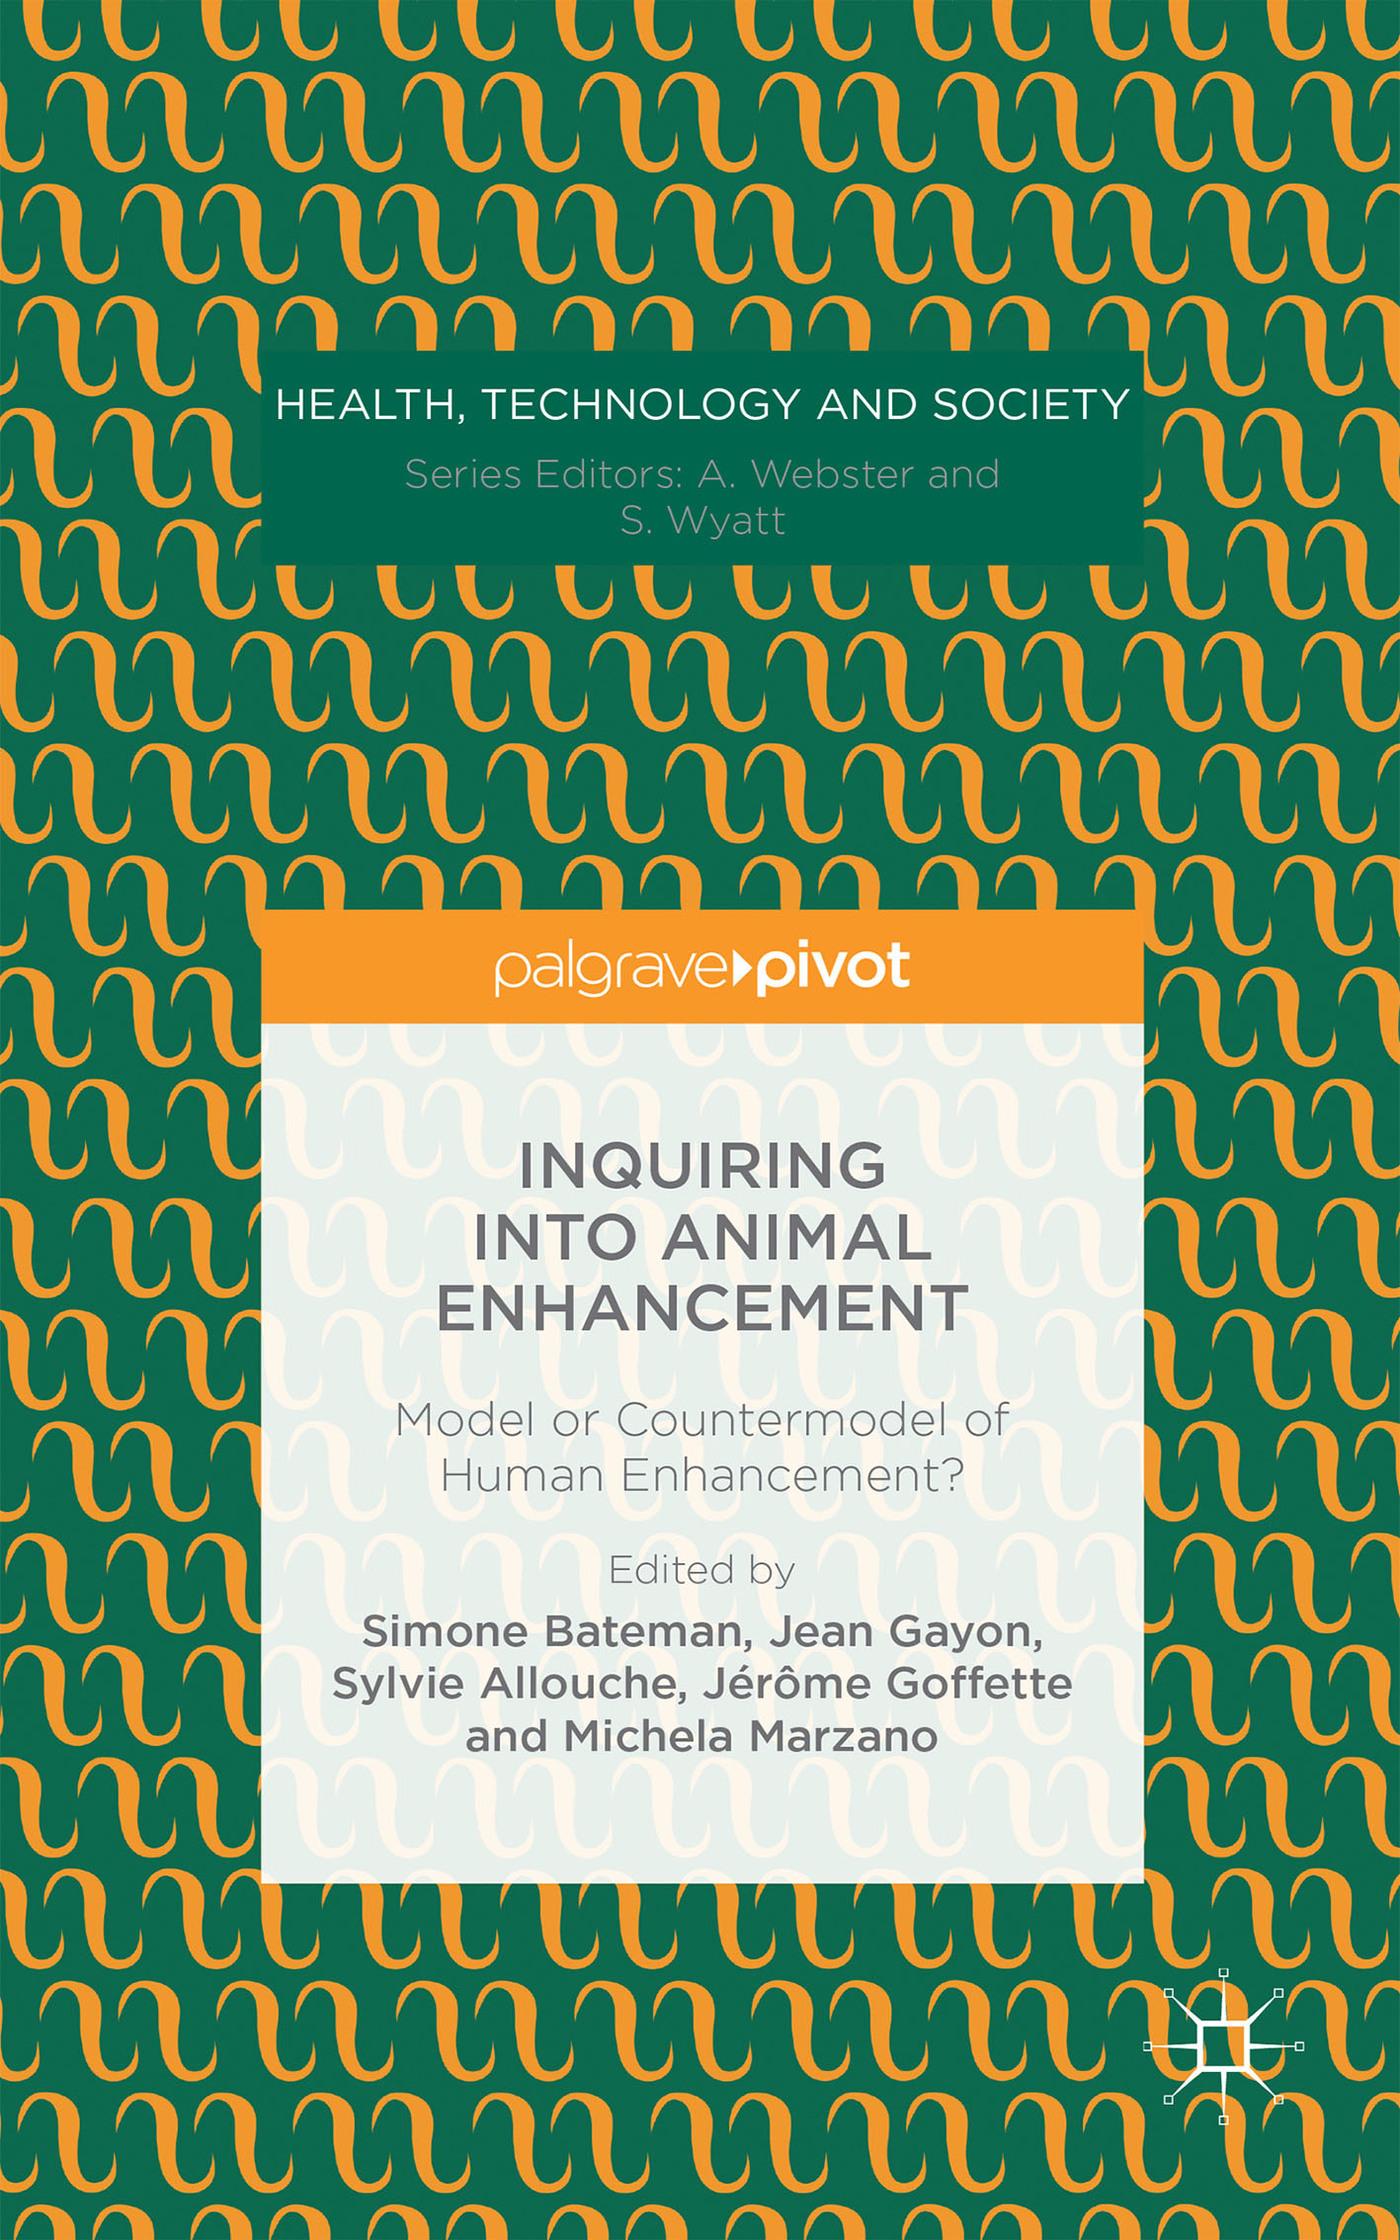 Inquiring into Animal Enhancement Model or Countermodel of Human Enhancement